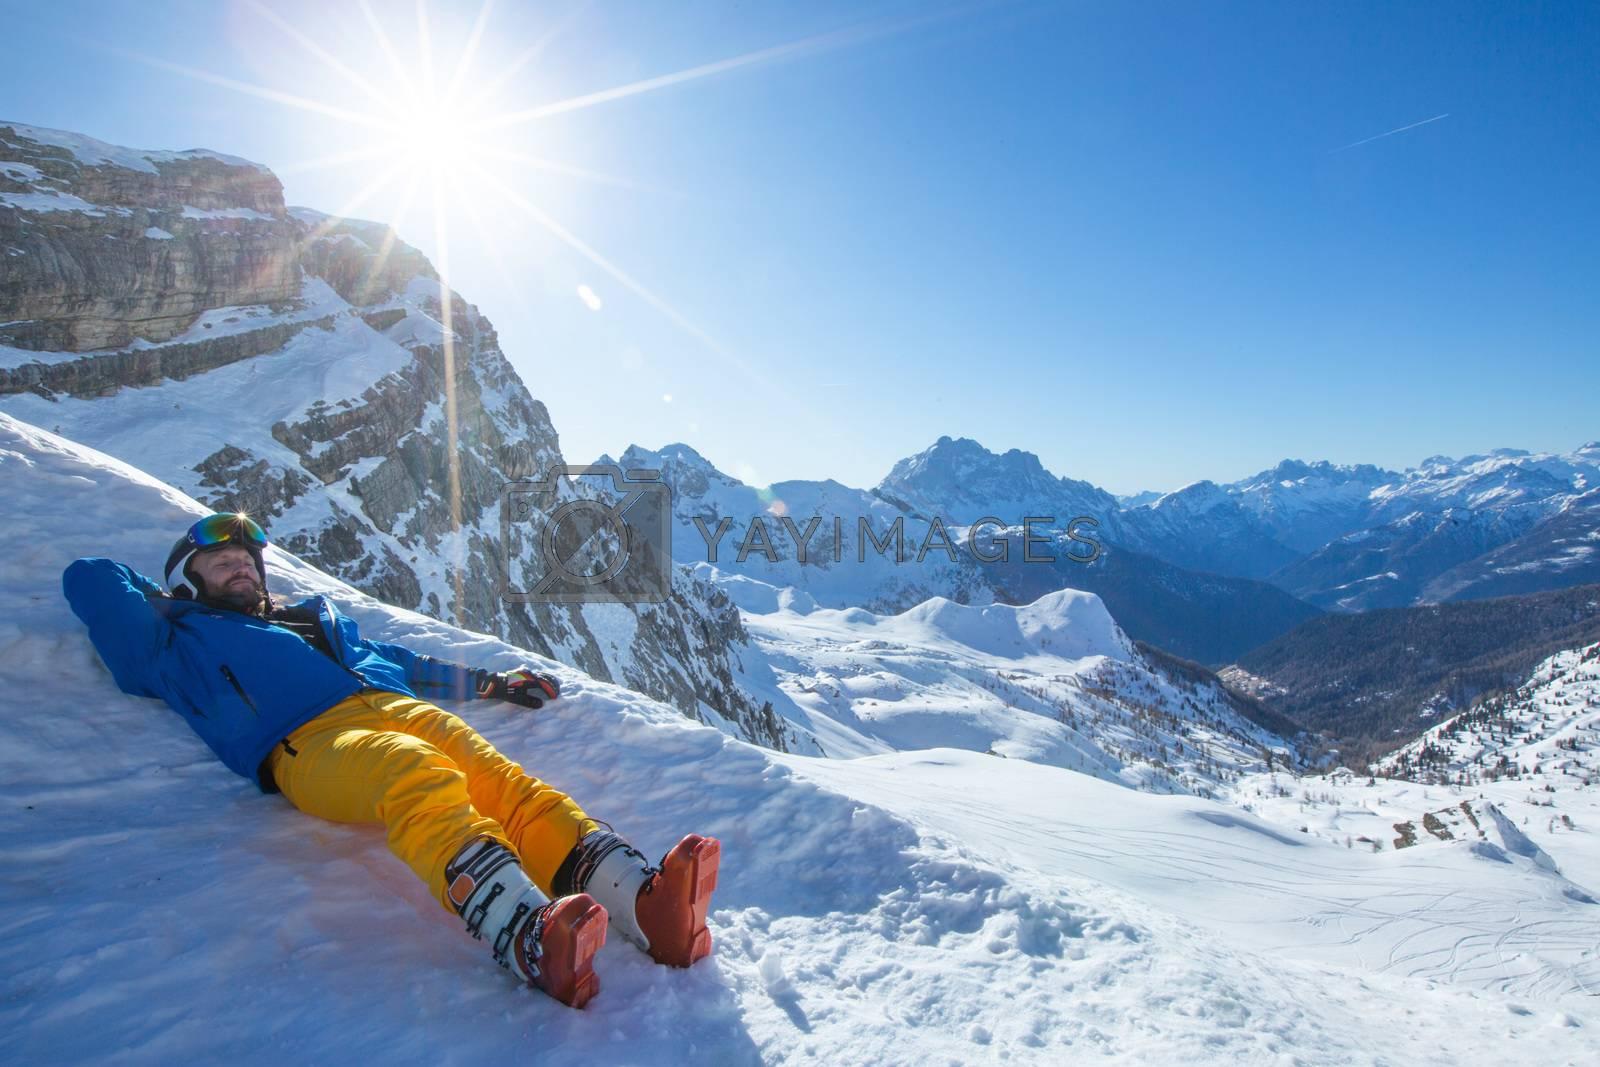 Alpine skier lay in winter mountains Dolomities Italy in beautiful alps Cortina d'Ampezzo Cinque torri mountain peaks famous landscape skiing resort area enjoy sunlight